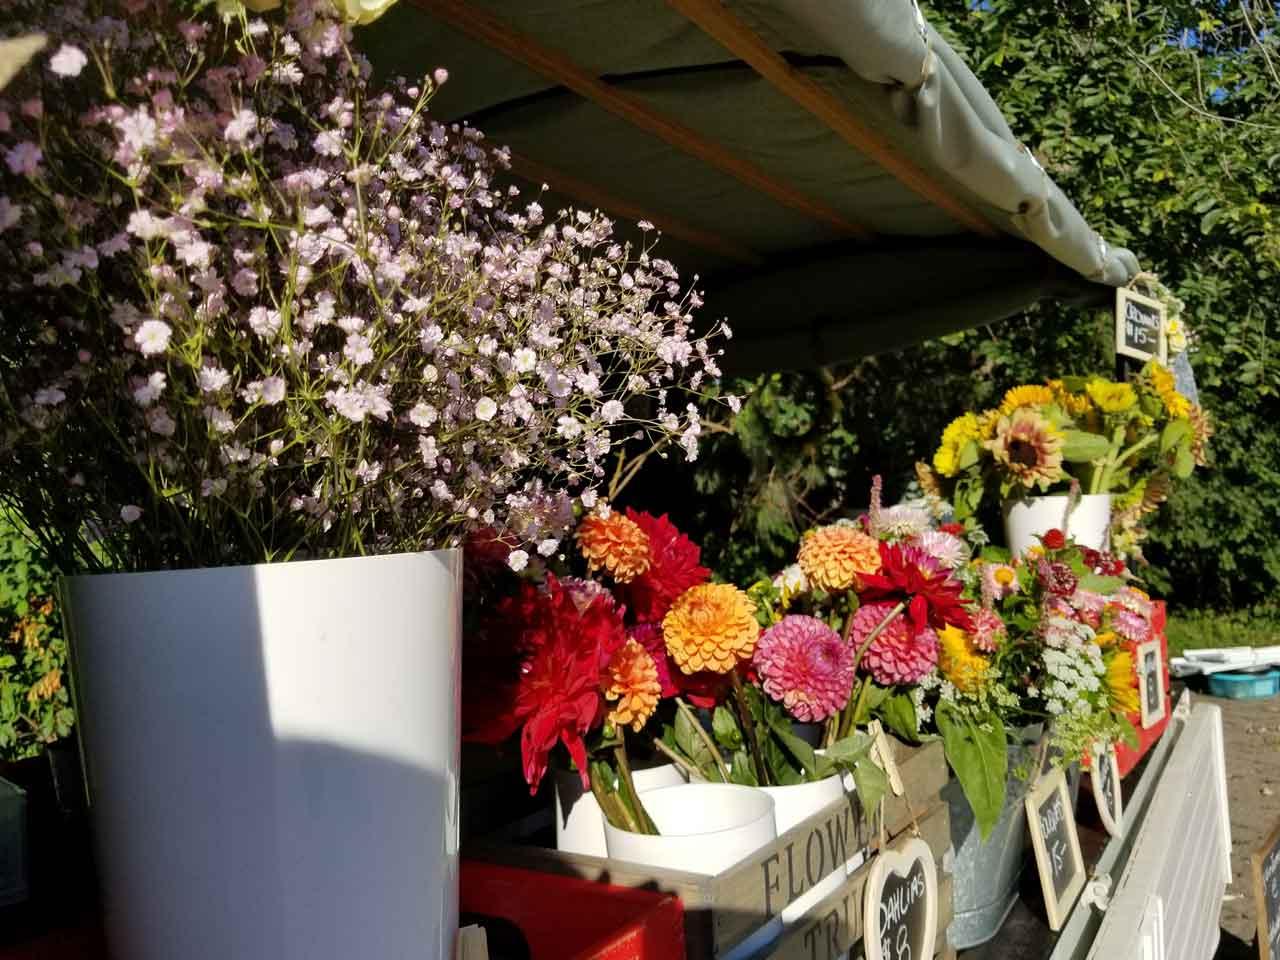 The Delicate Flower Truck Farmers Market Photo